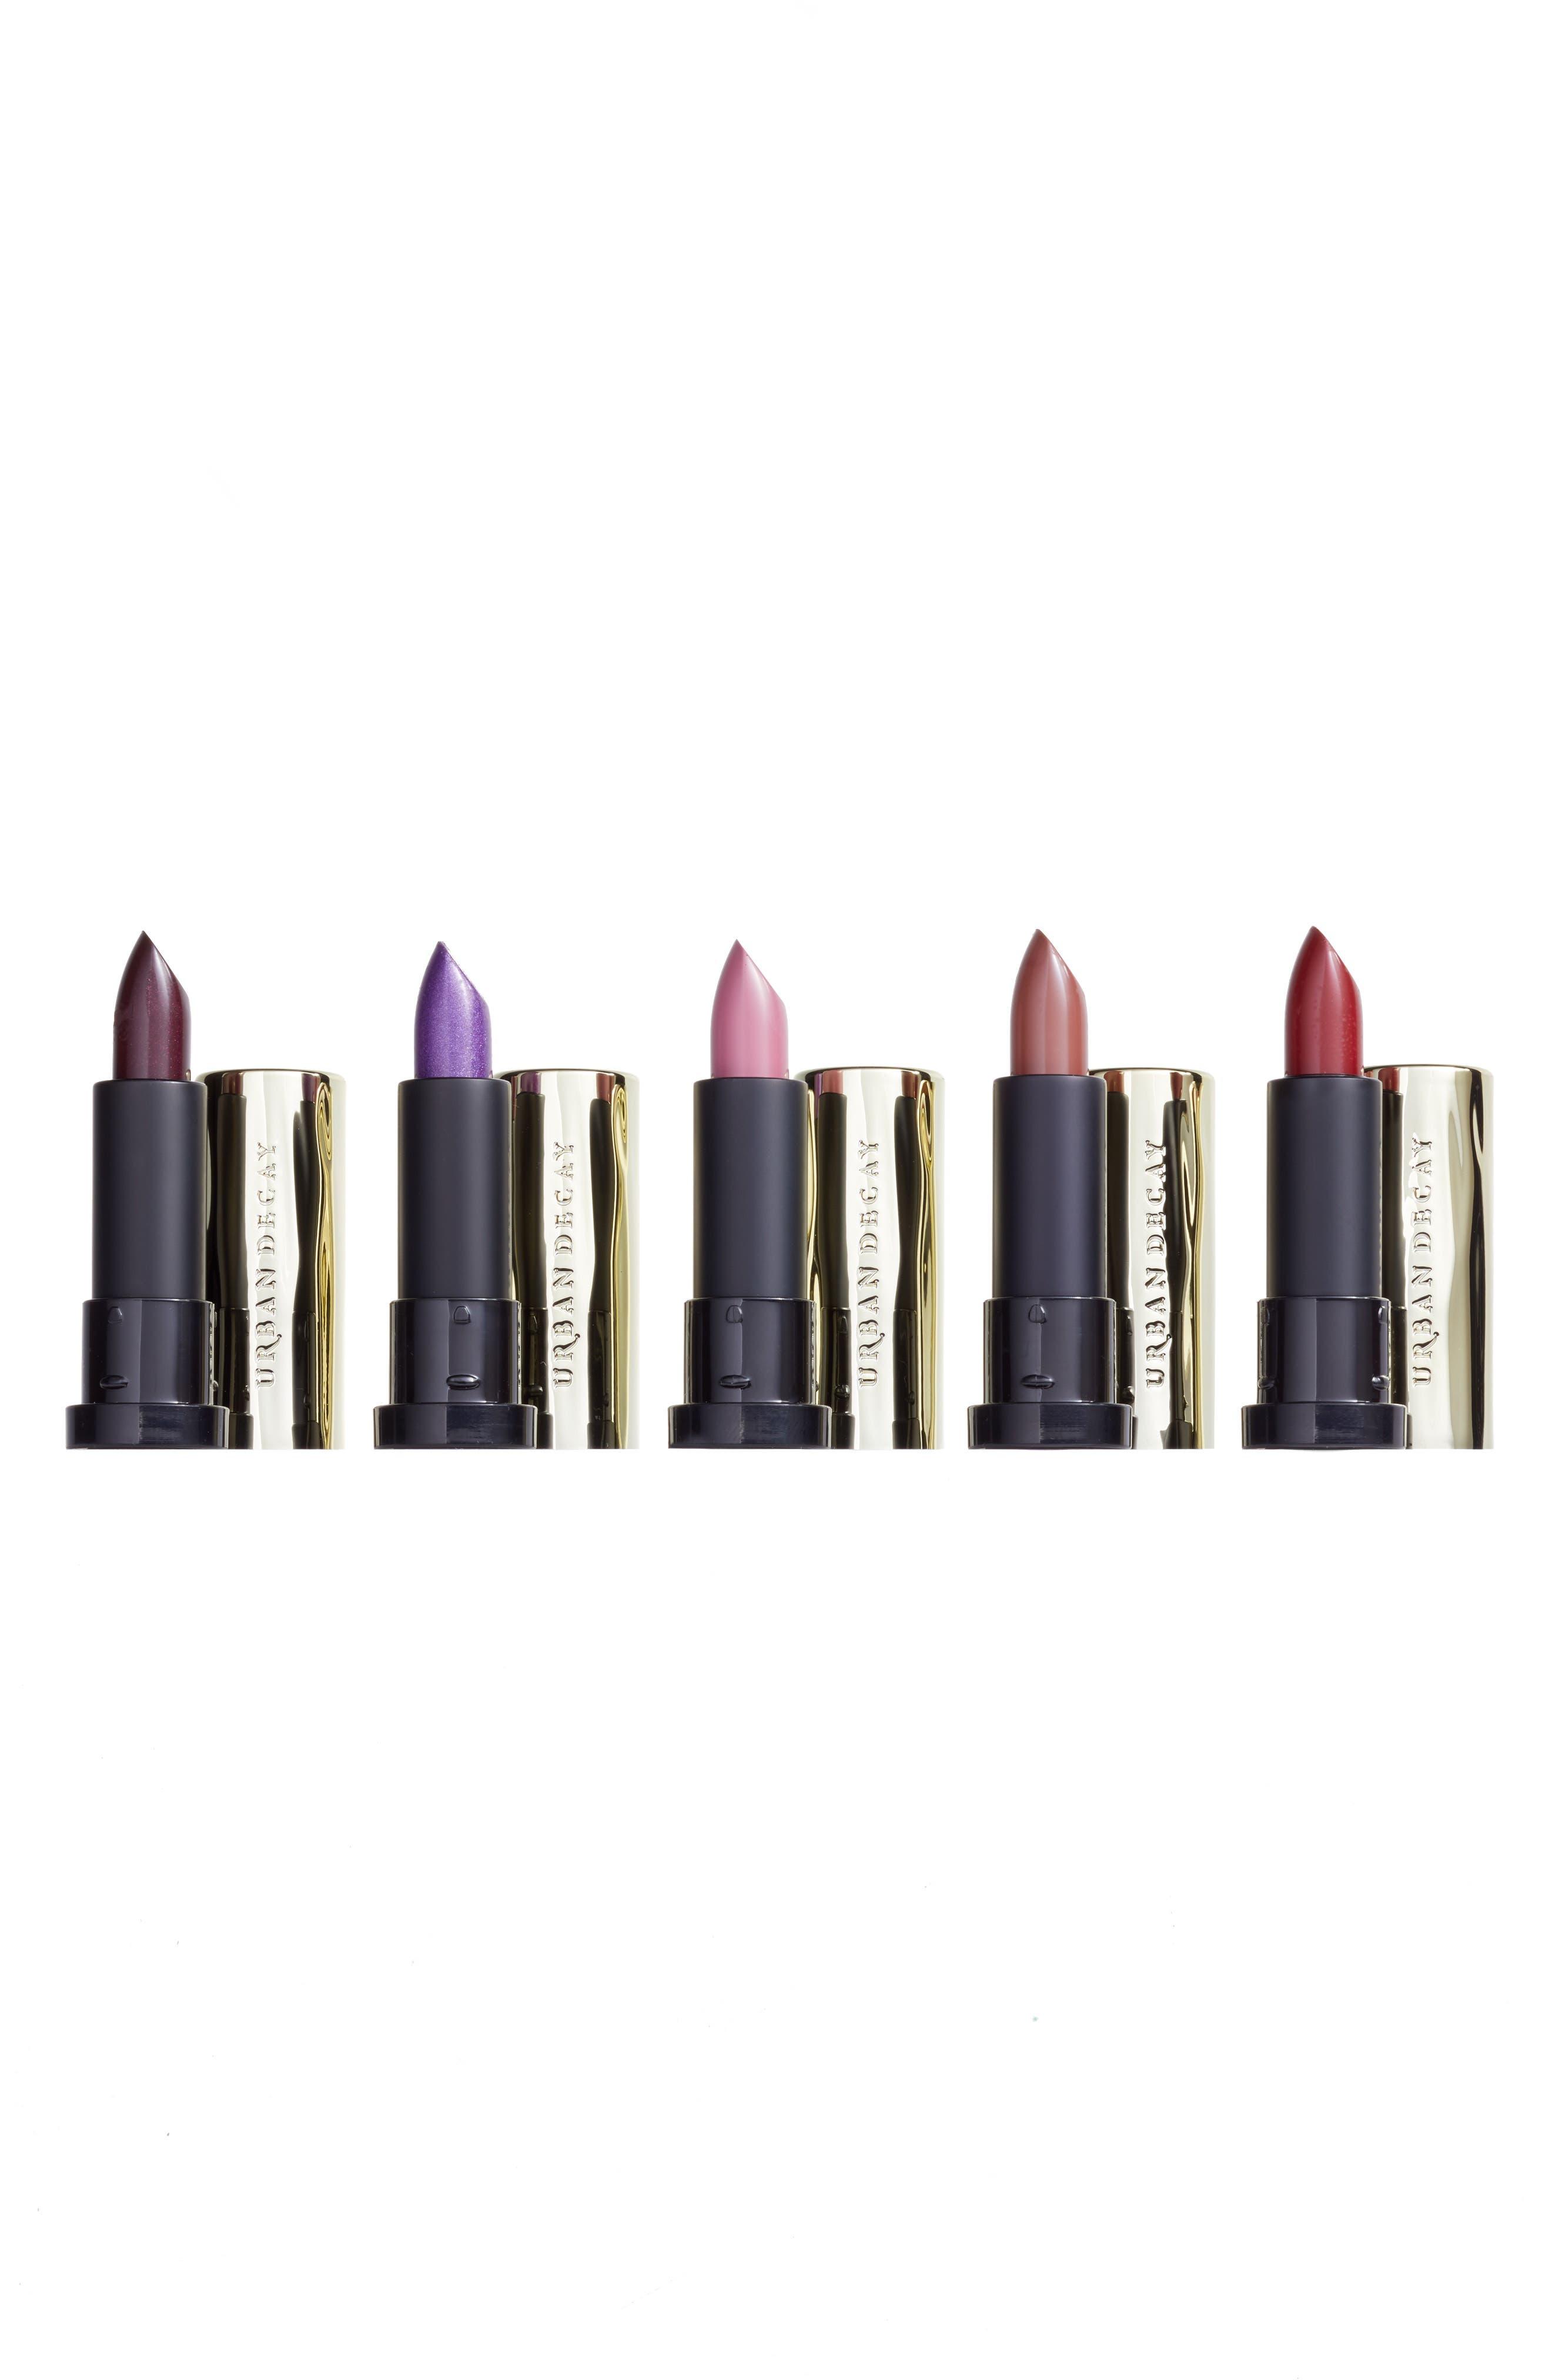 Main Image - Urban Decay Little Vices 5-Piece Lipstick Sample Set